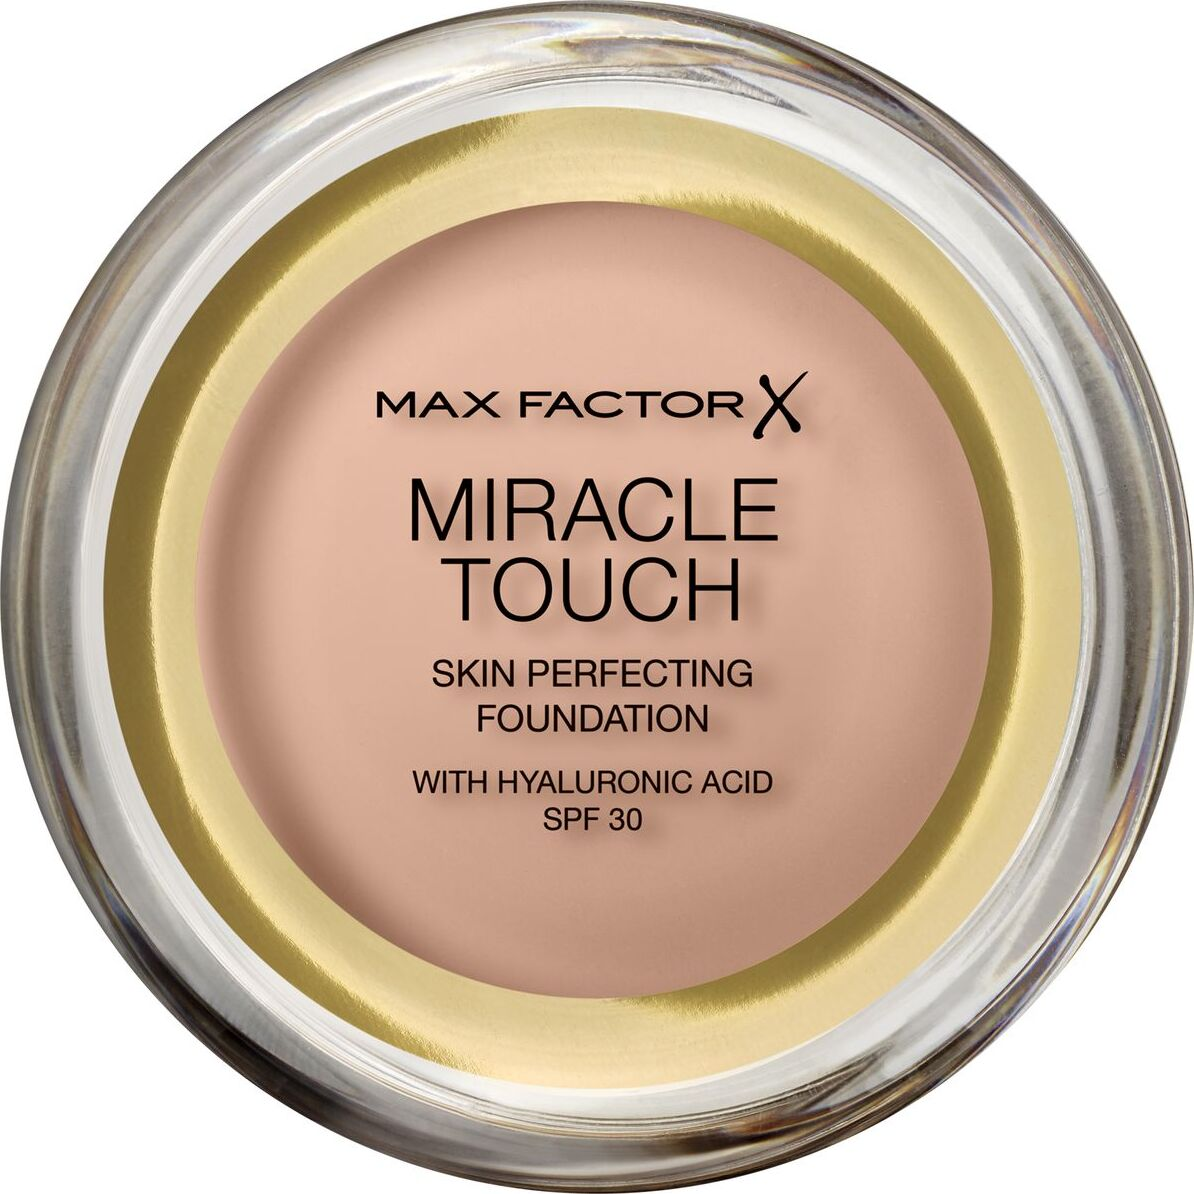 Тональная основа Max Factor Miracle Touch, SPF 30, тон 55 Blushing Beige, 11 мл основа под макияж max factor miracle prep colour correcting cooling тон green 30 мл